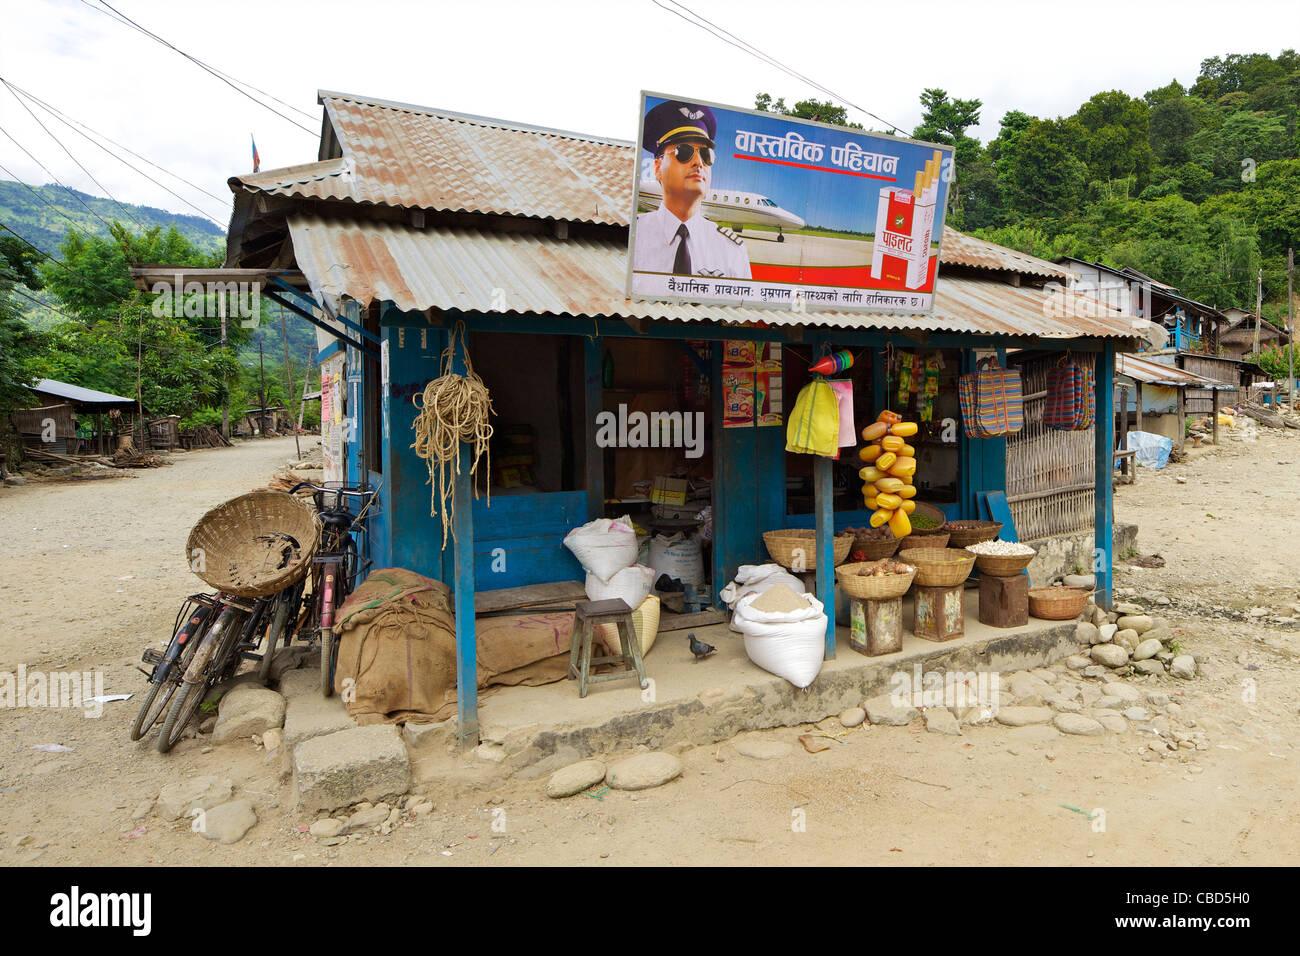 Cigarette advertisement, airline pilot, shop front, Chatara town, Terai, Nepal, Asia - Stock Image